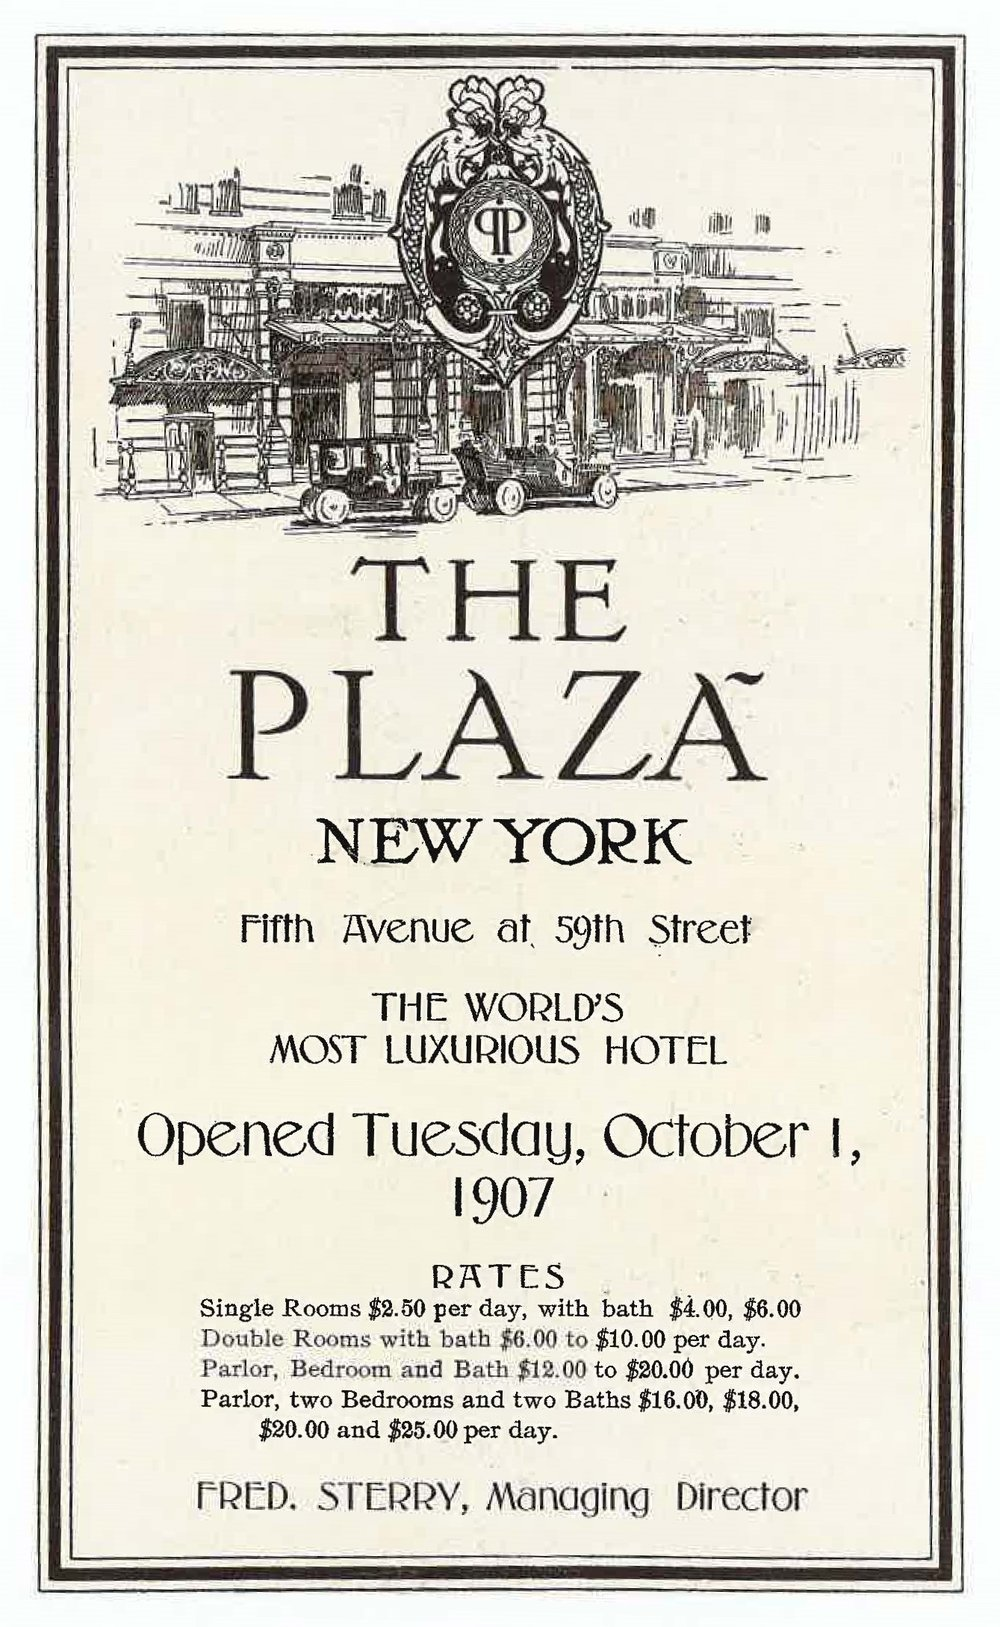 ©At The Plaza